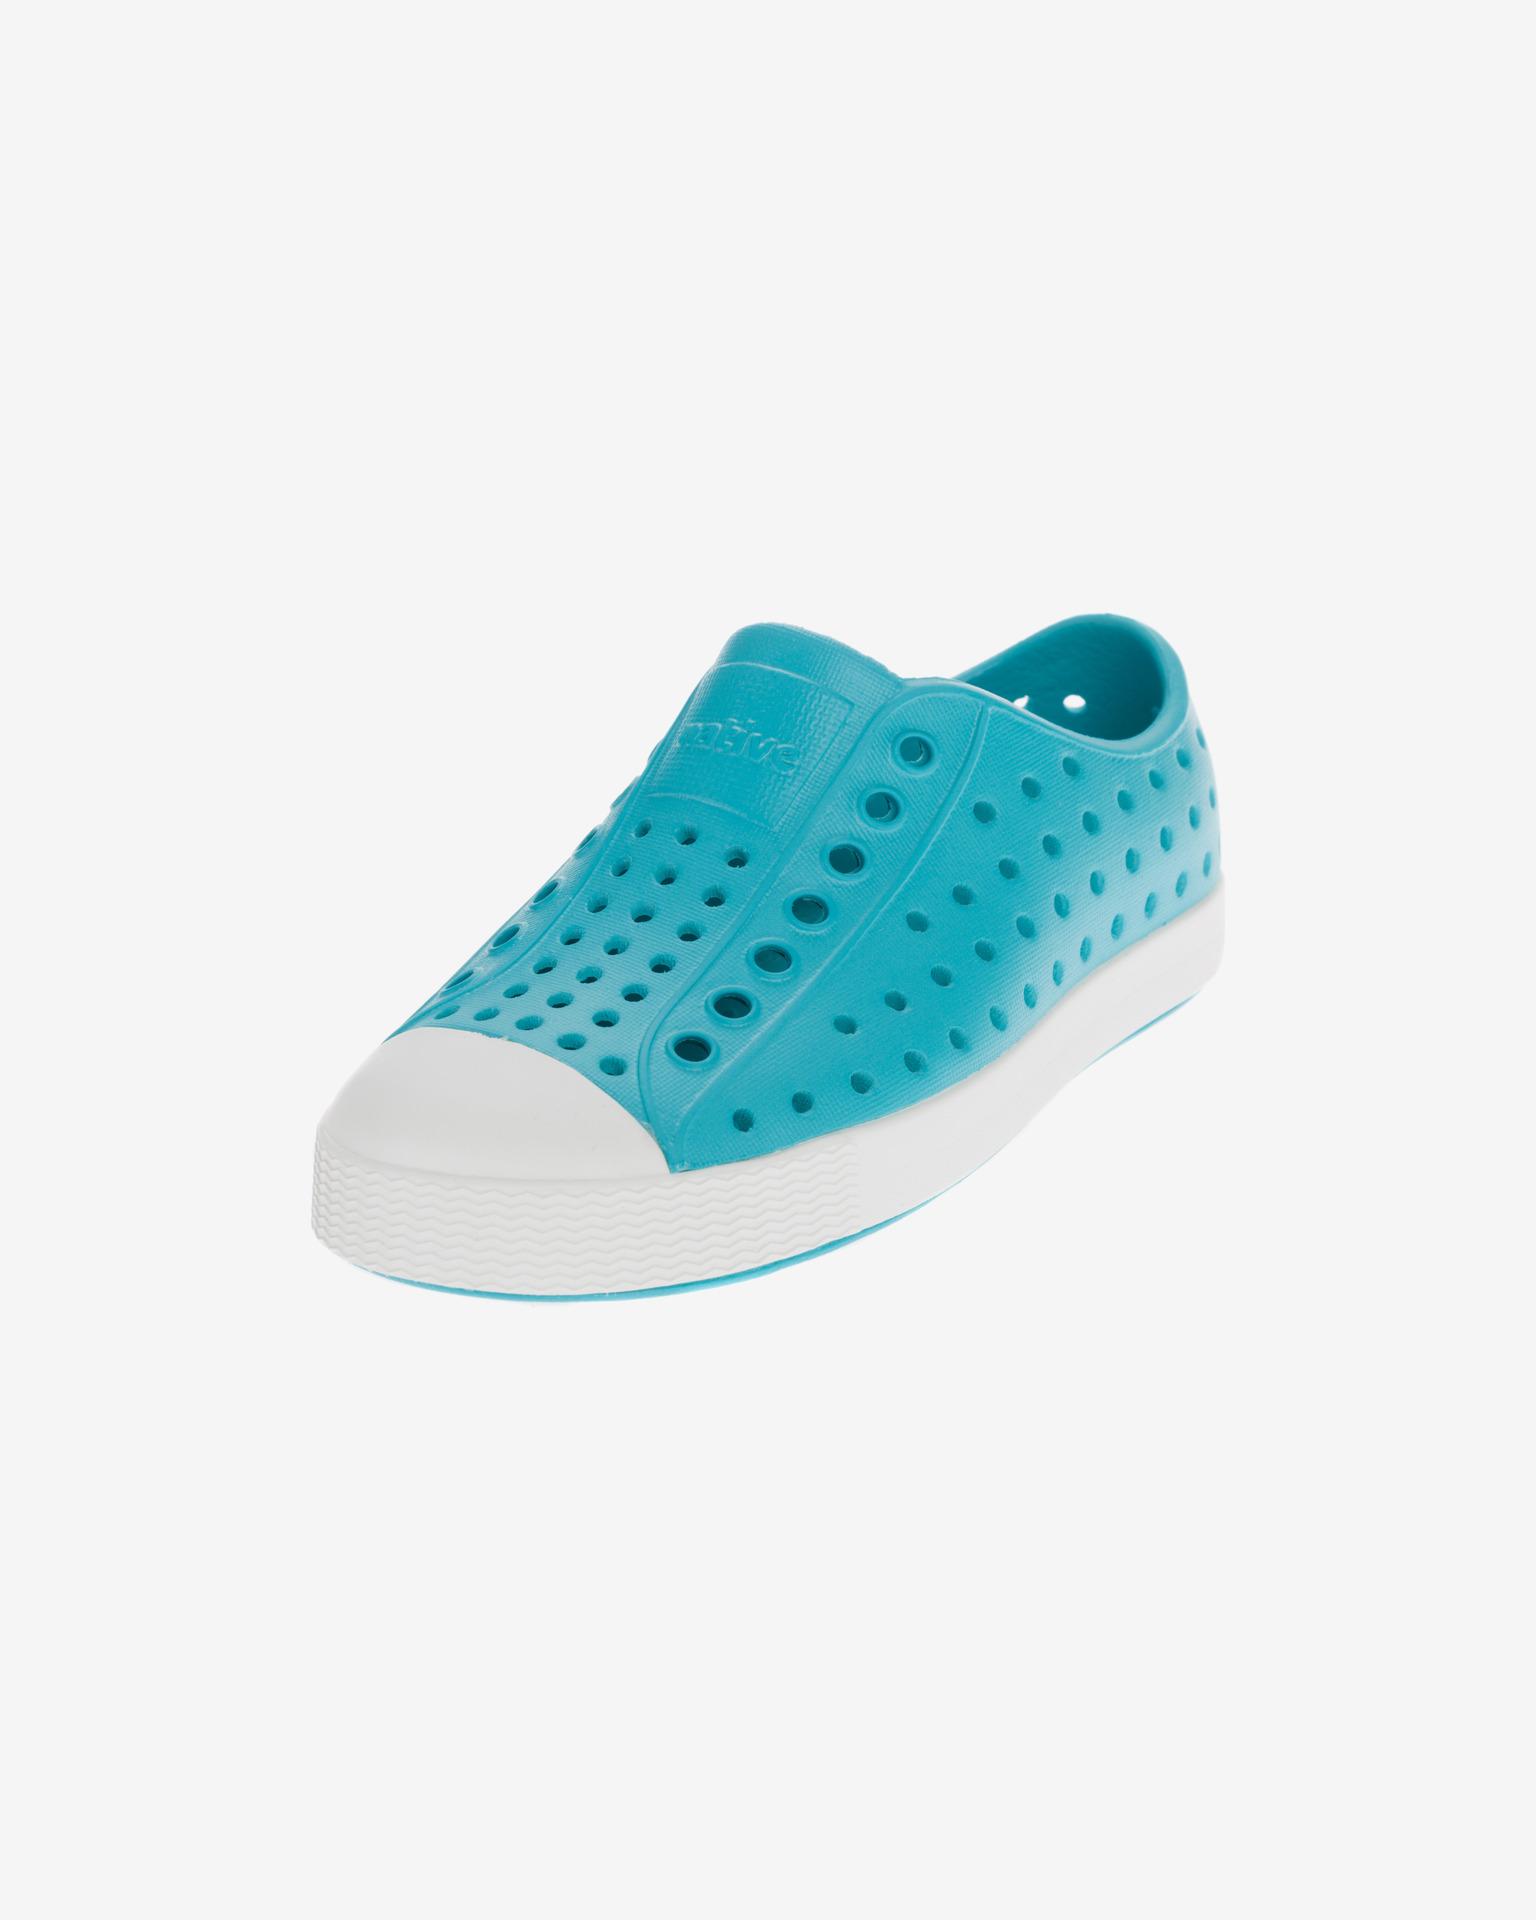 Jefferson Espadrilles Chaussures Indigènes eyc3V